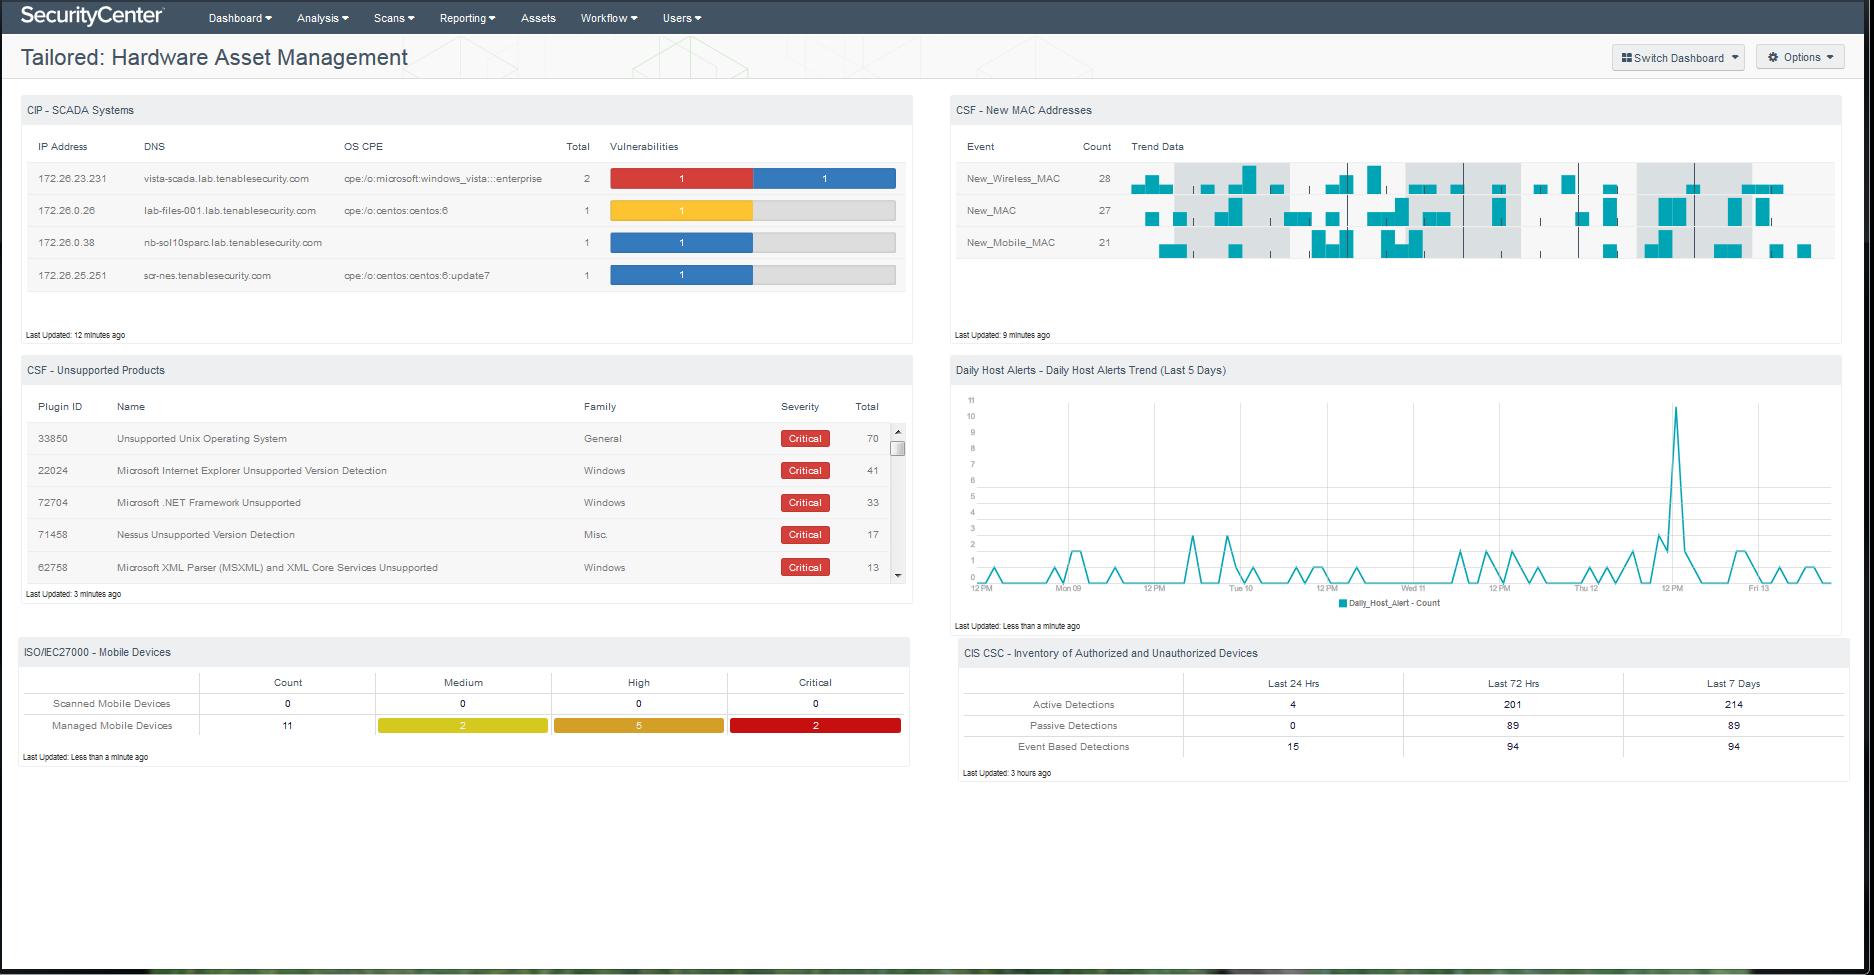 Tailored hardware asset management dashboard